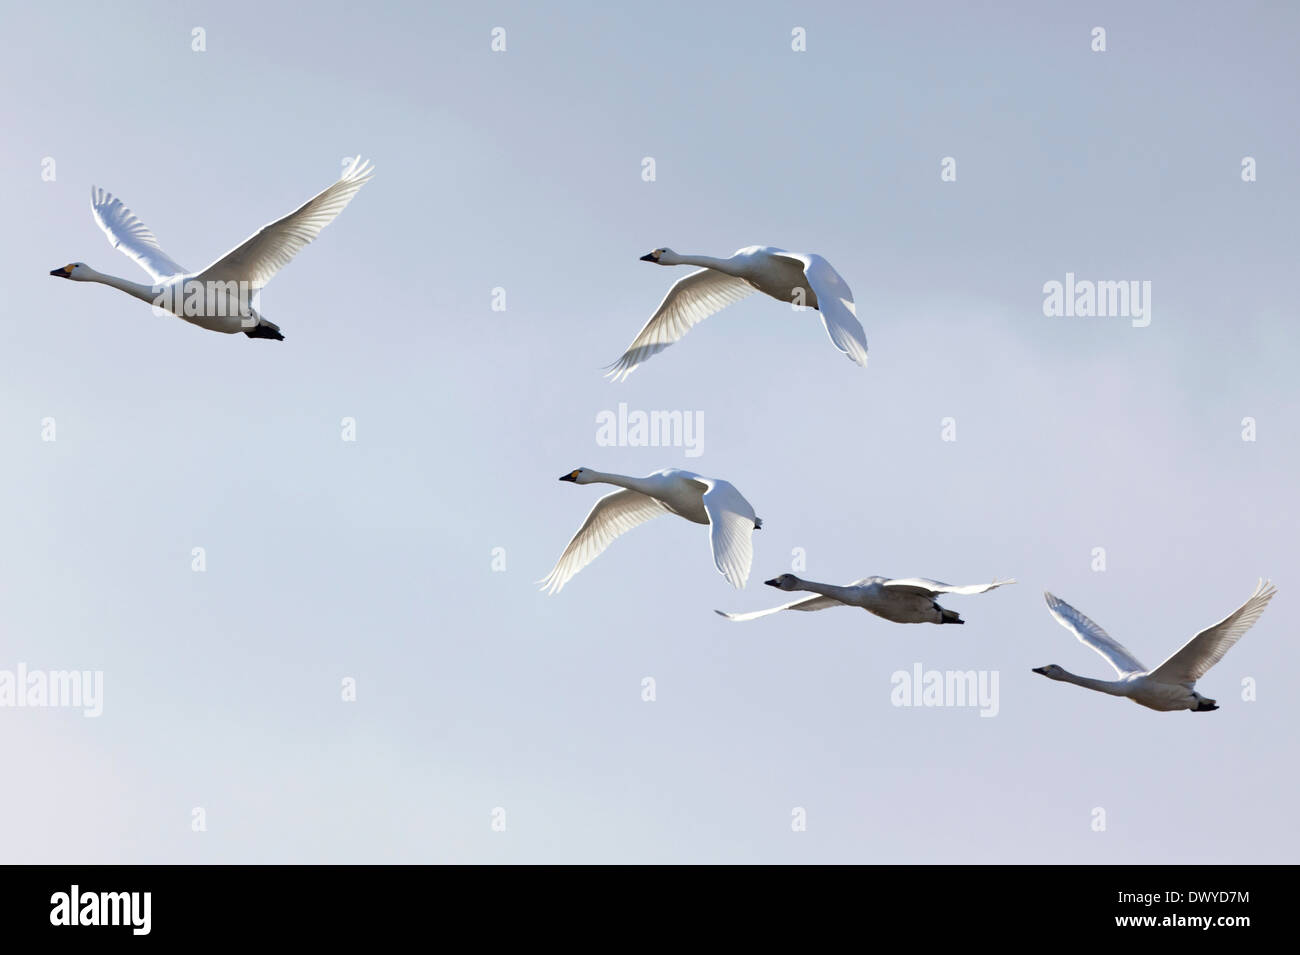 Birds Flying in the Sky Stock Photo